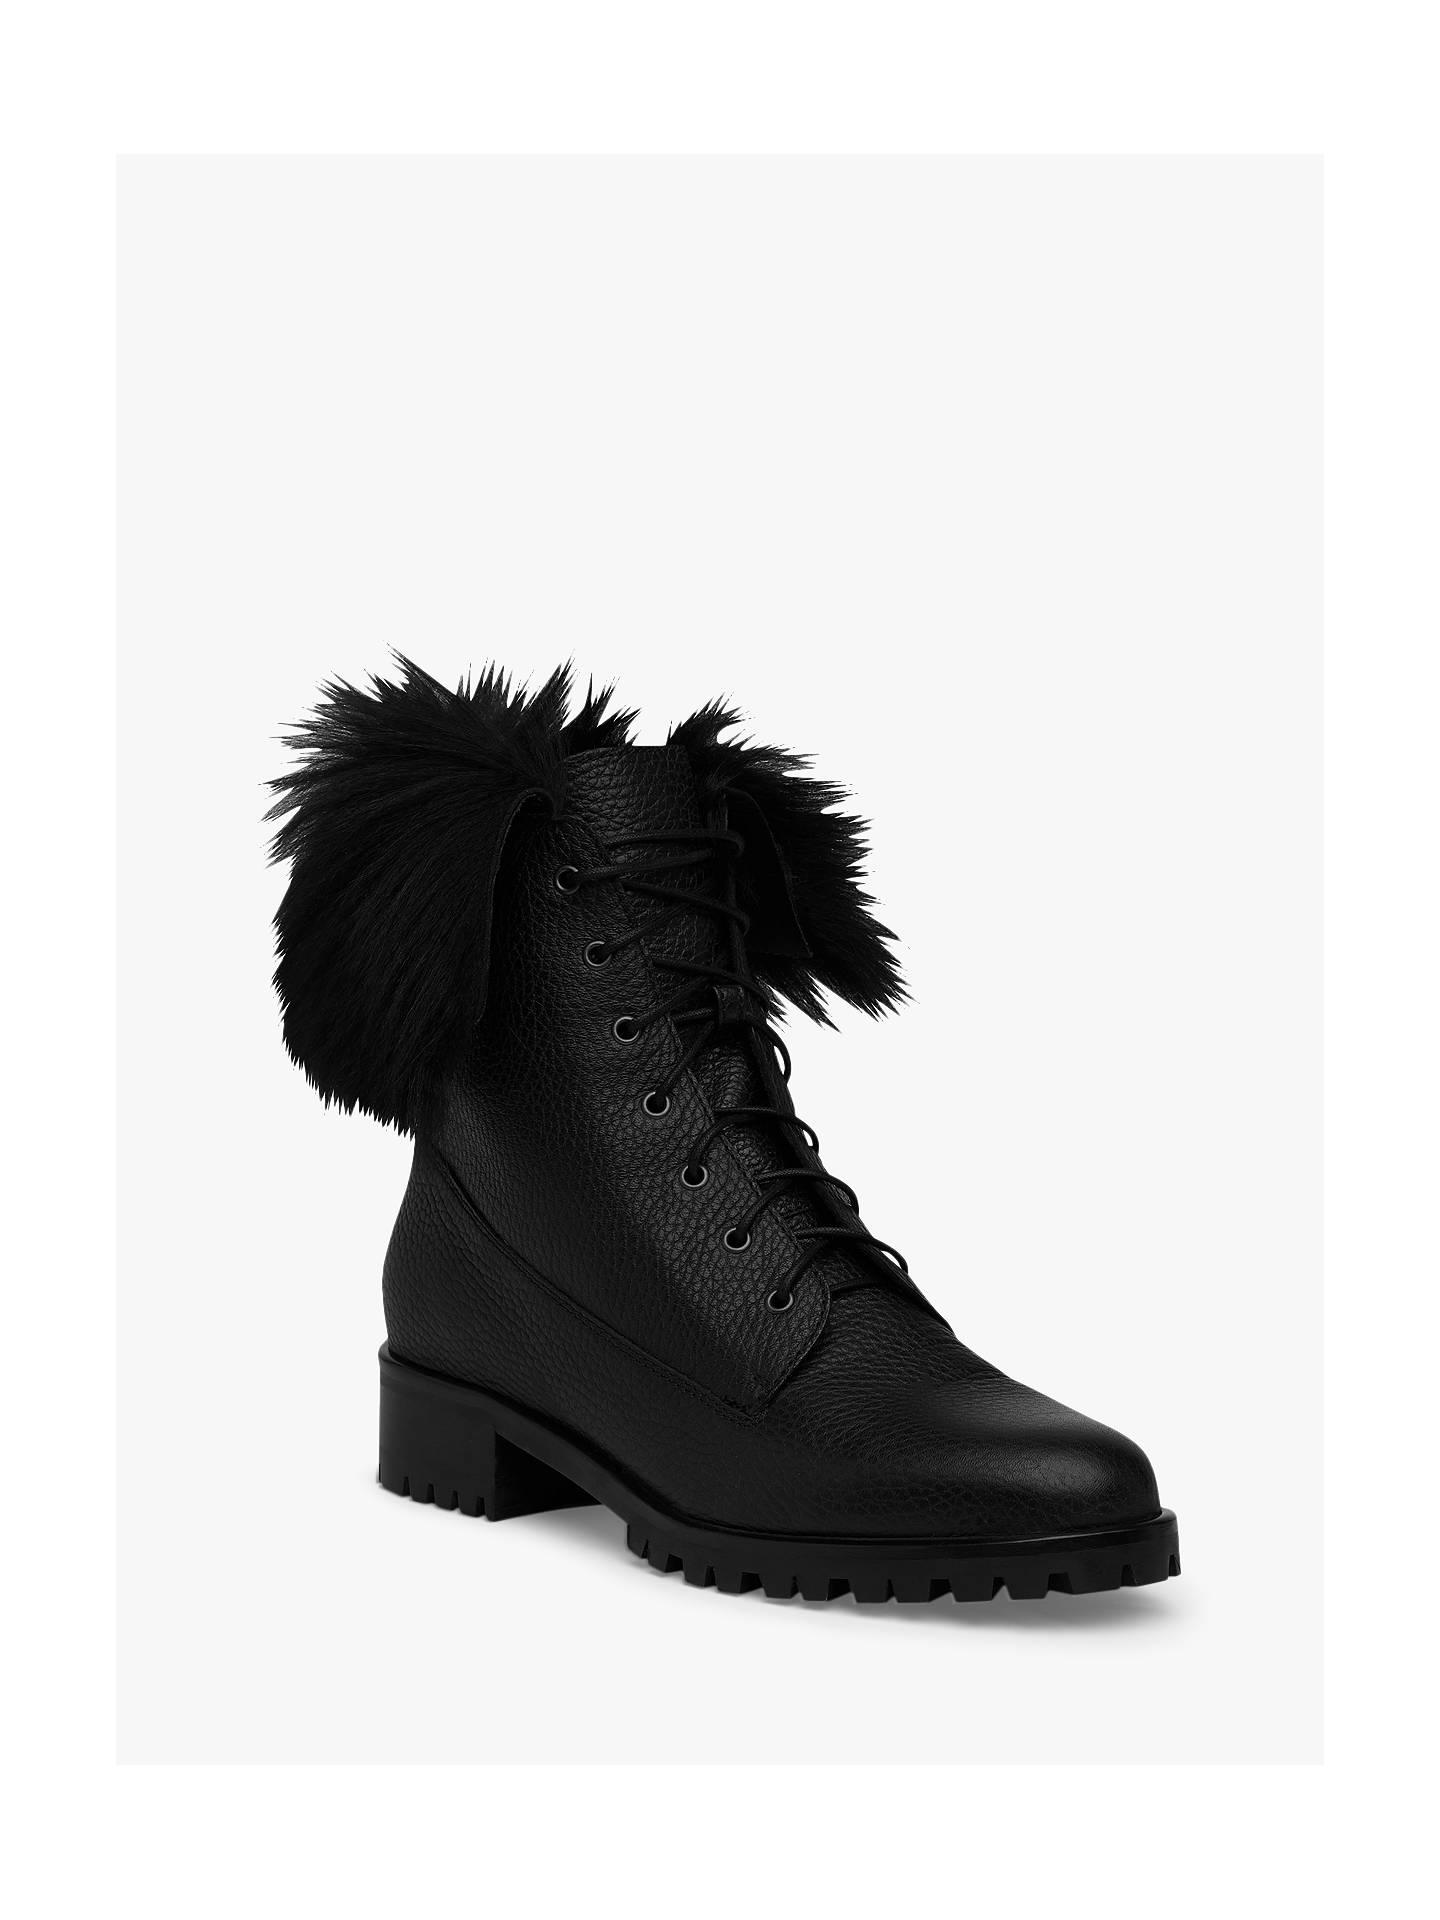 da96213bf L.K.Bennett Delli Faux Fur Trim Ankle Lace Up Boots, Black at John ...